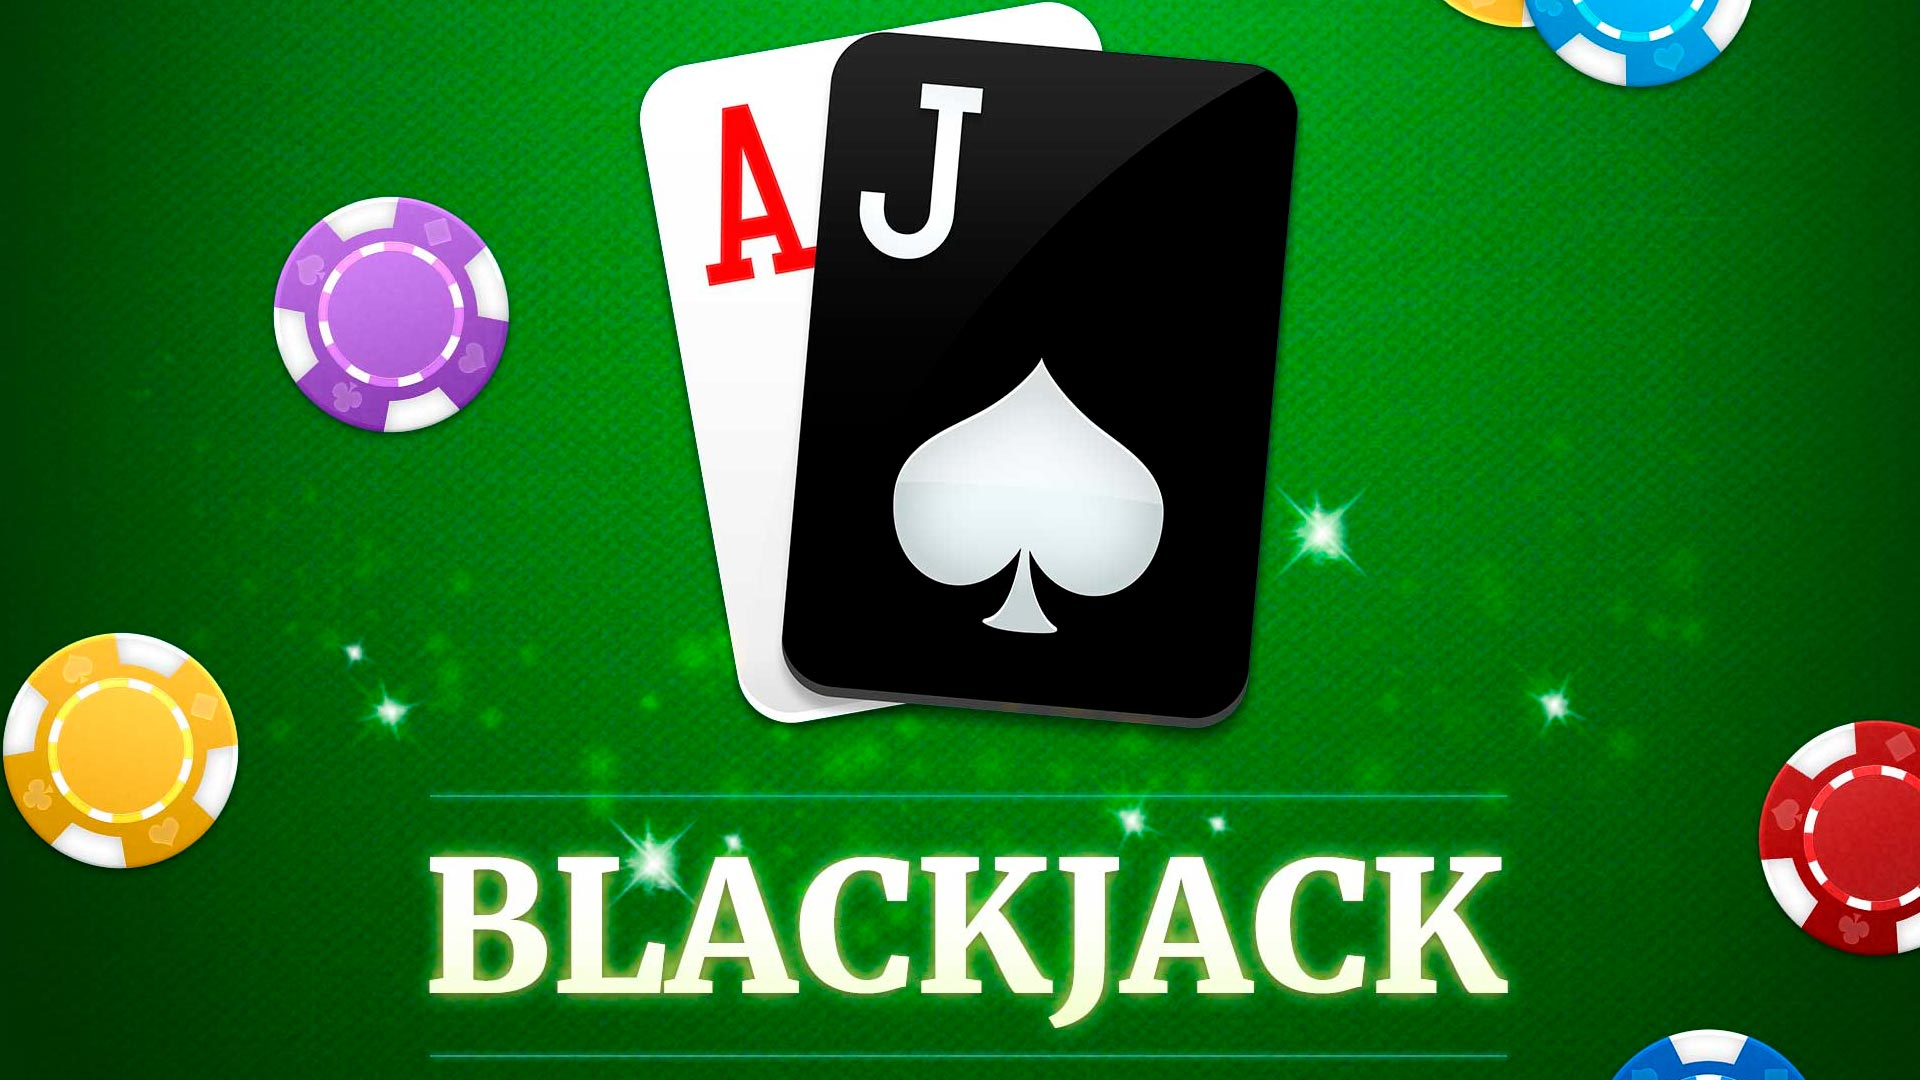 Blackjack strategies and chips